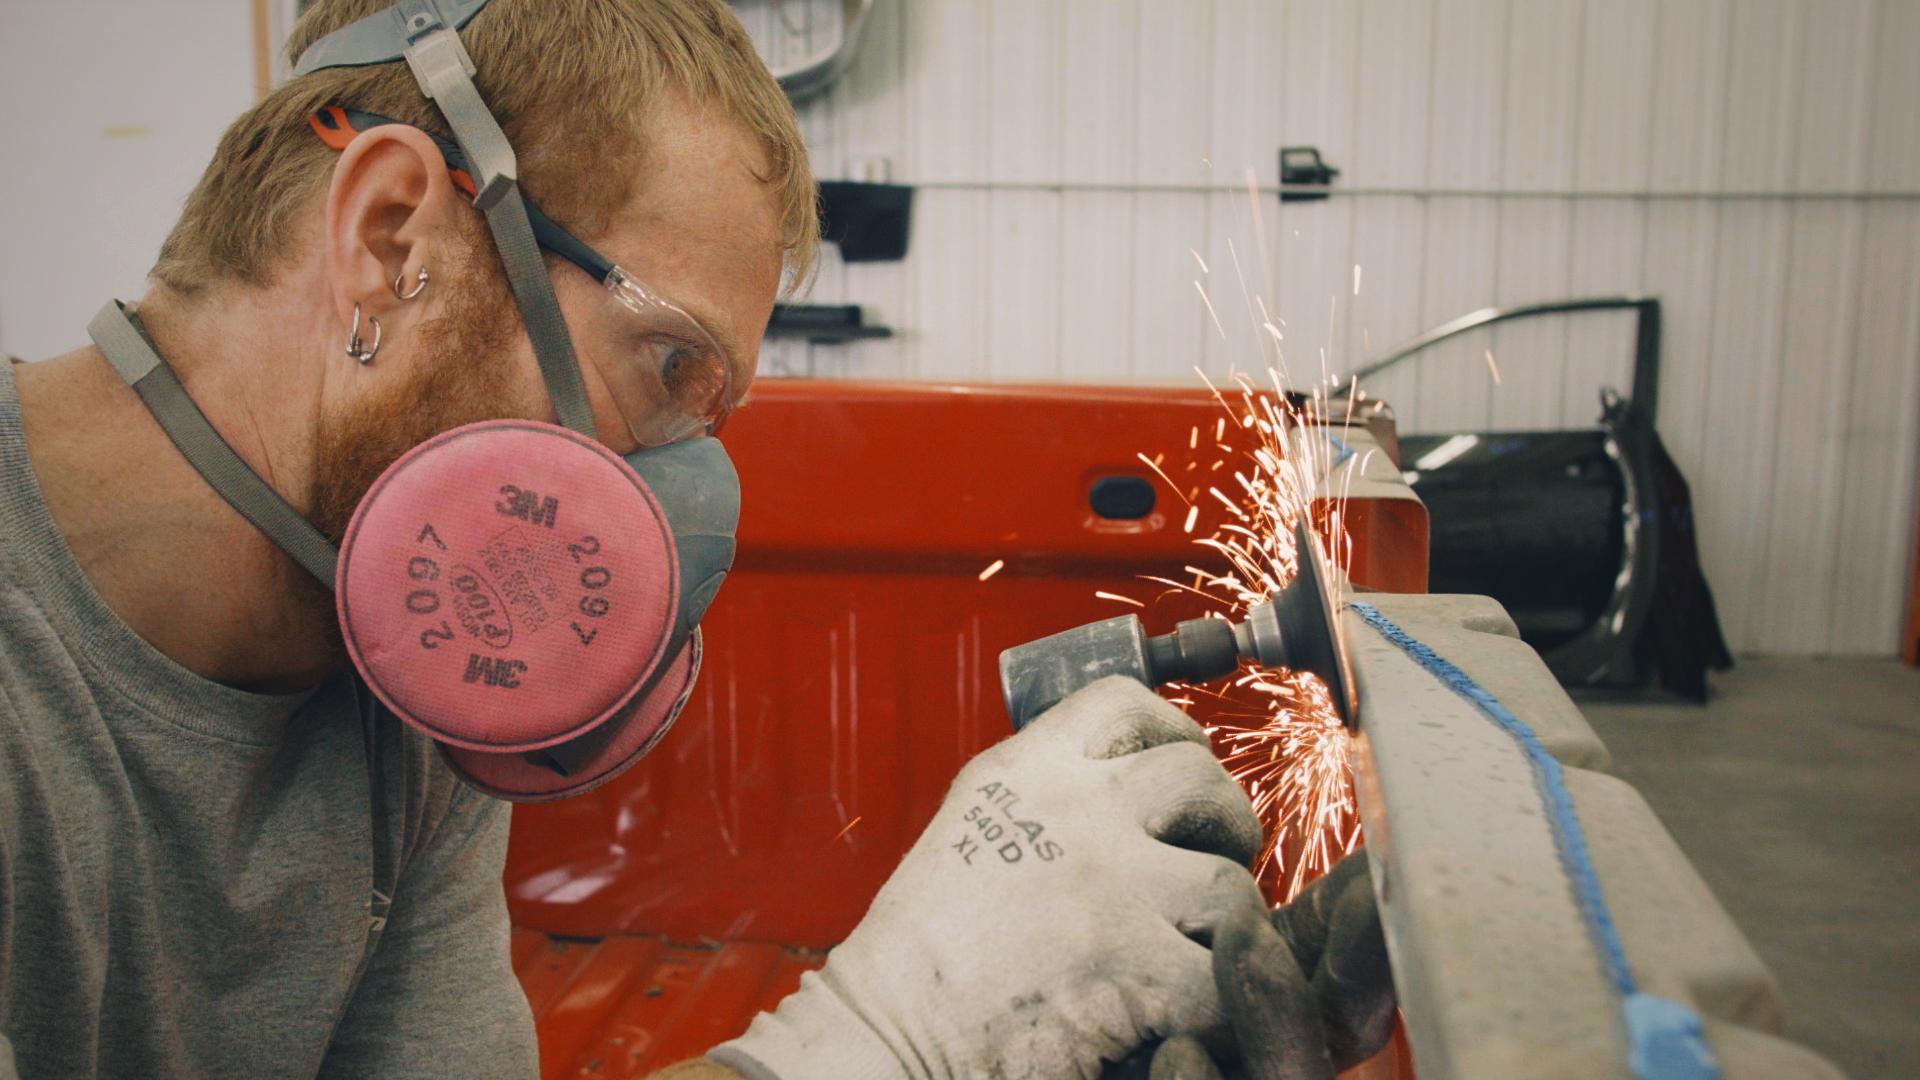 Golden Hammer Collision shop body tech working